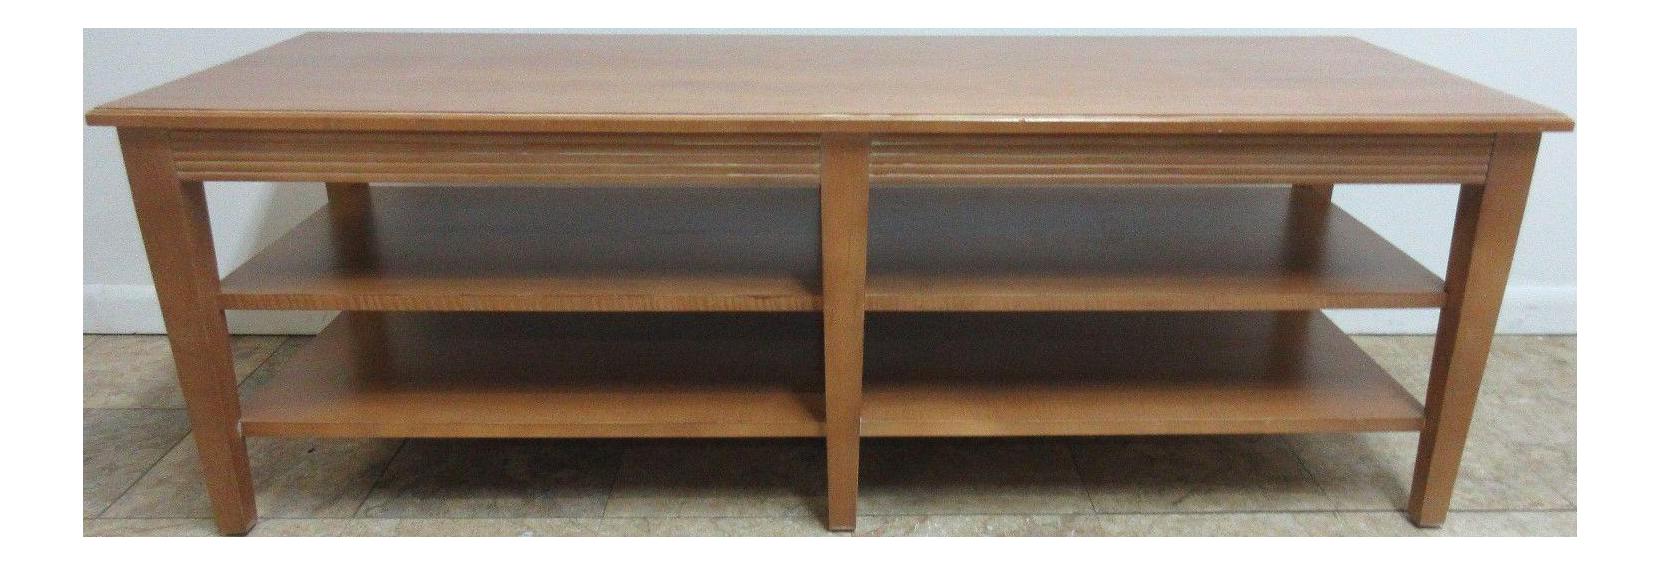 Ethan Allen Swedish Home Long Coffee Table